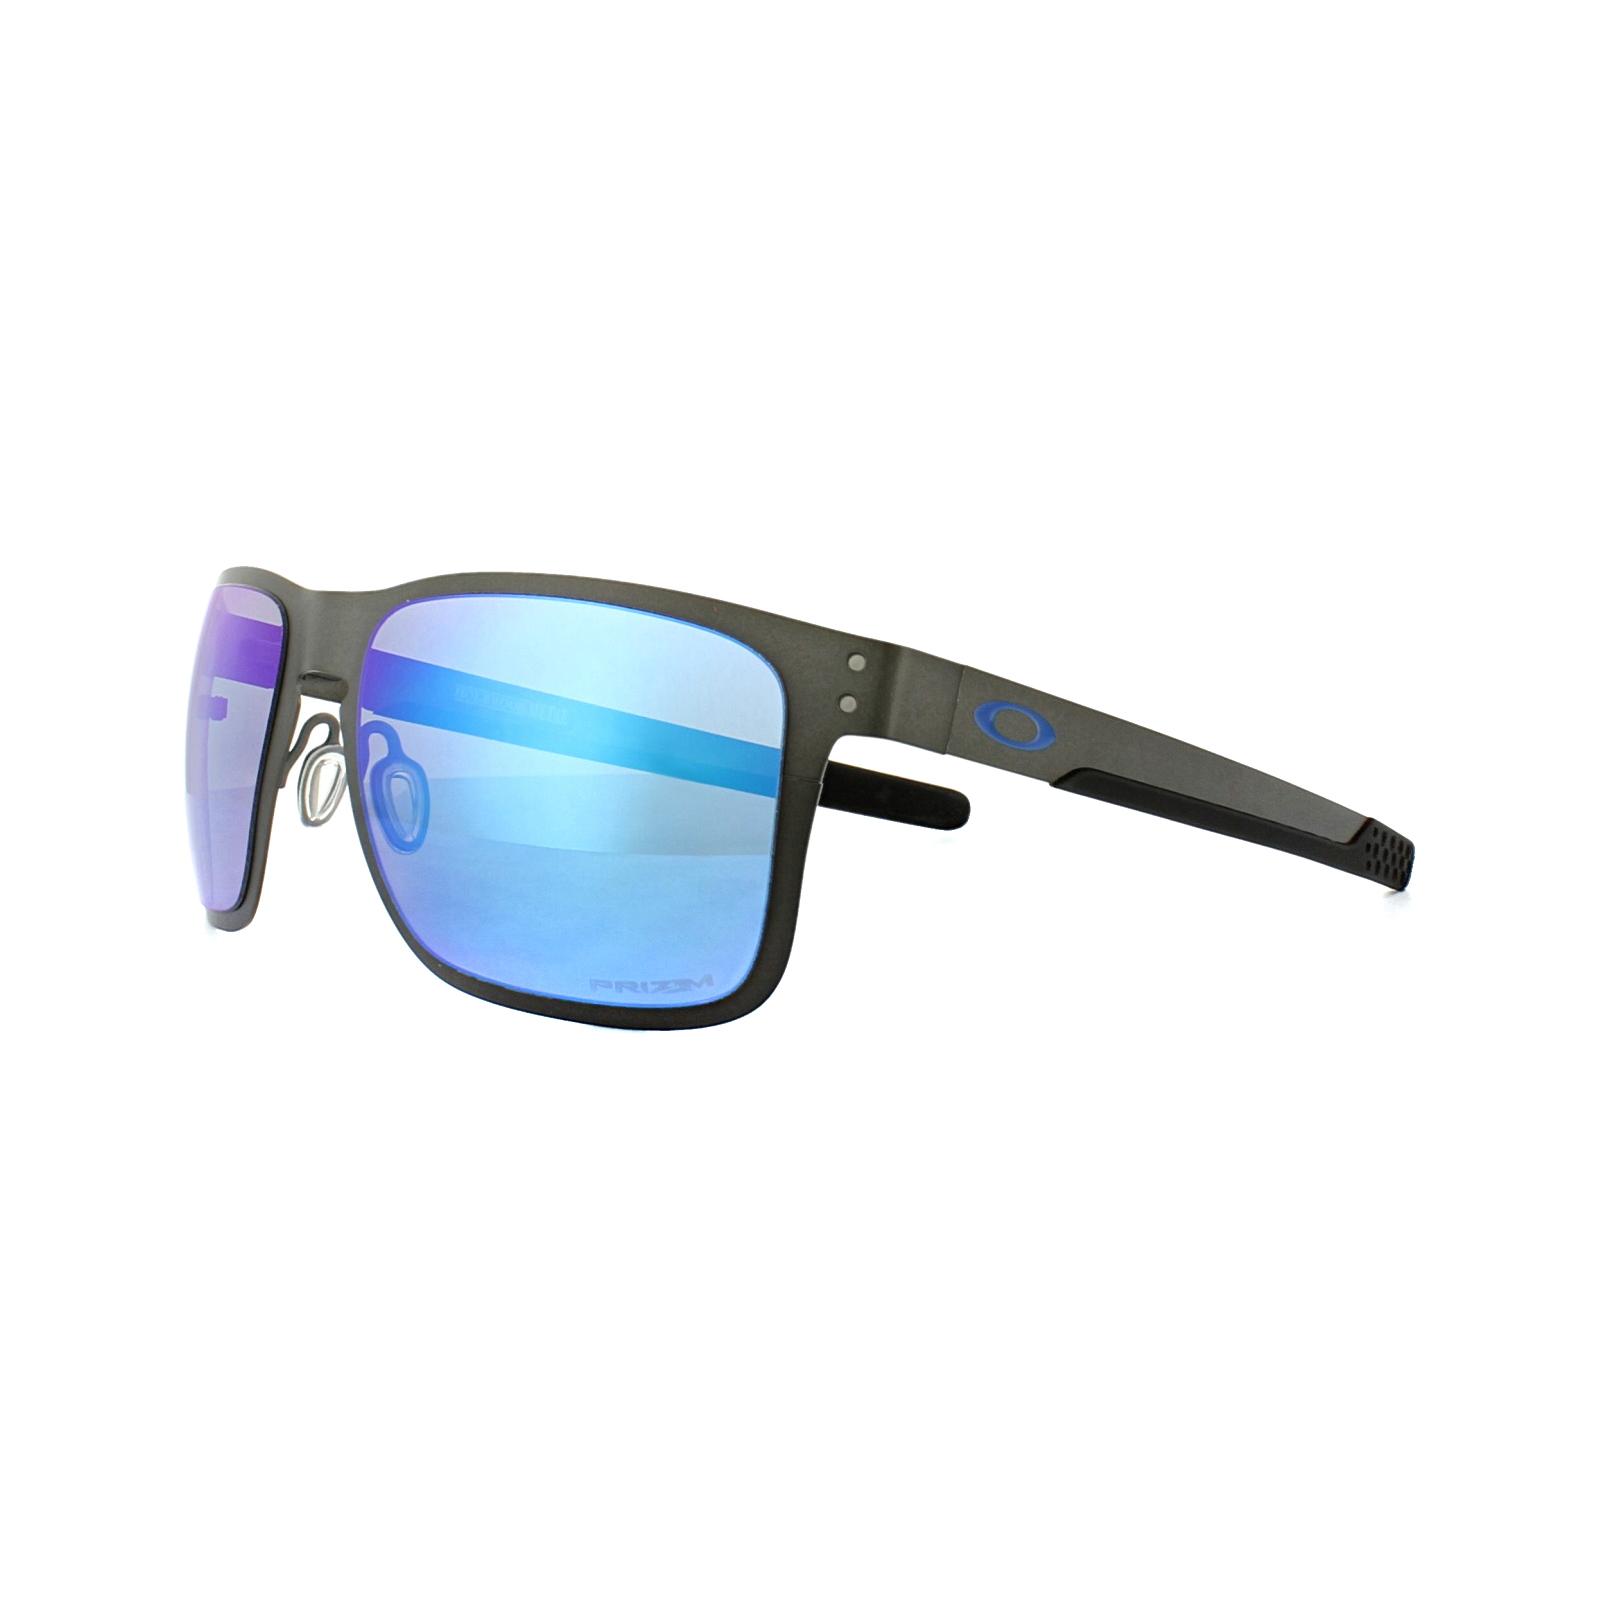 6cc66cda9df Sentinel Oakley Sunglasses Holbrook Metal OO4123-07 Gunmetal Prizm Sapphire  Polarized